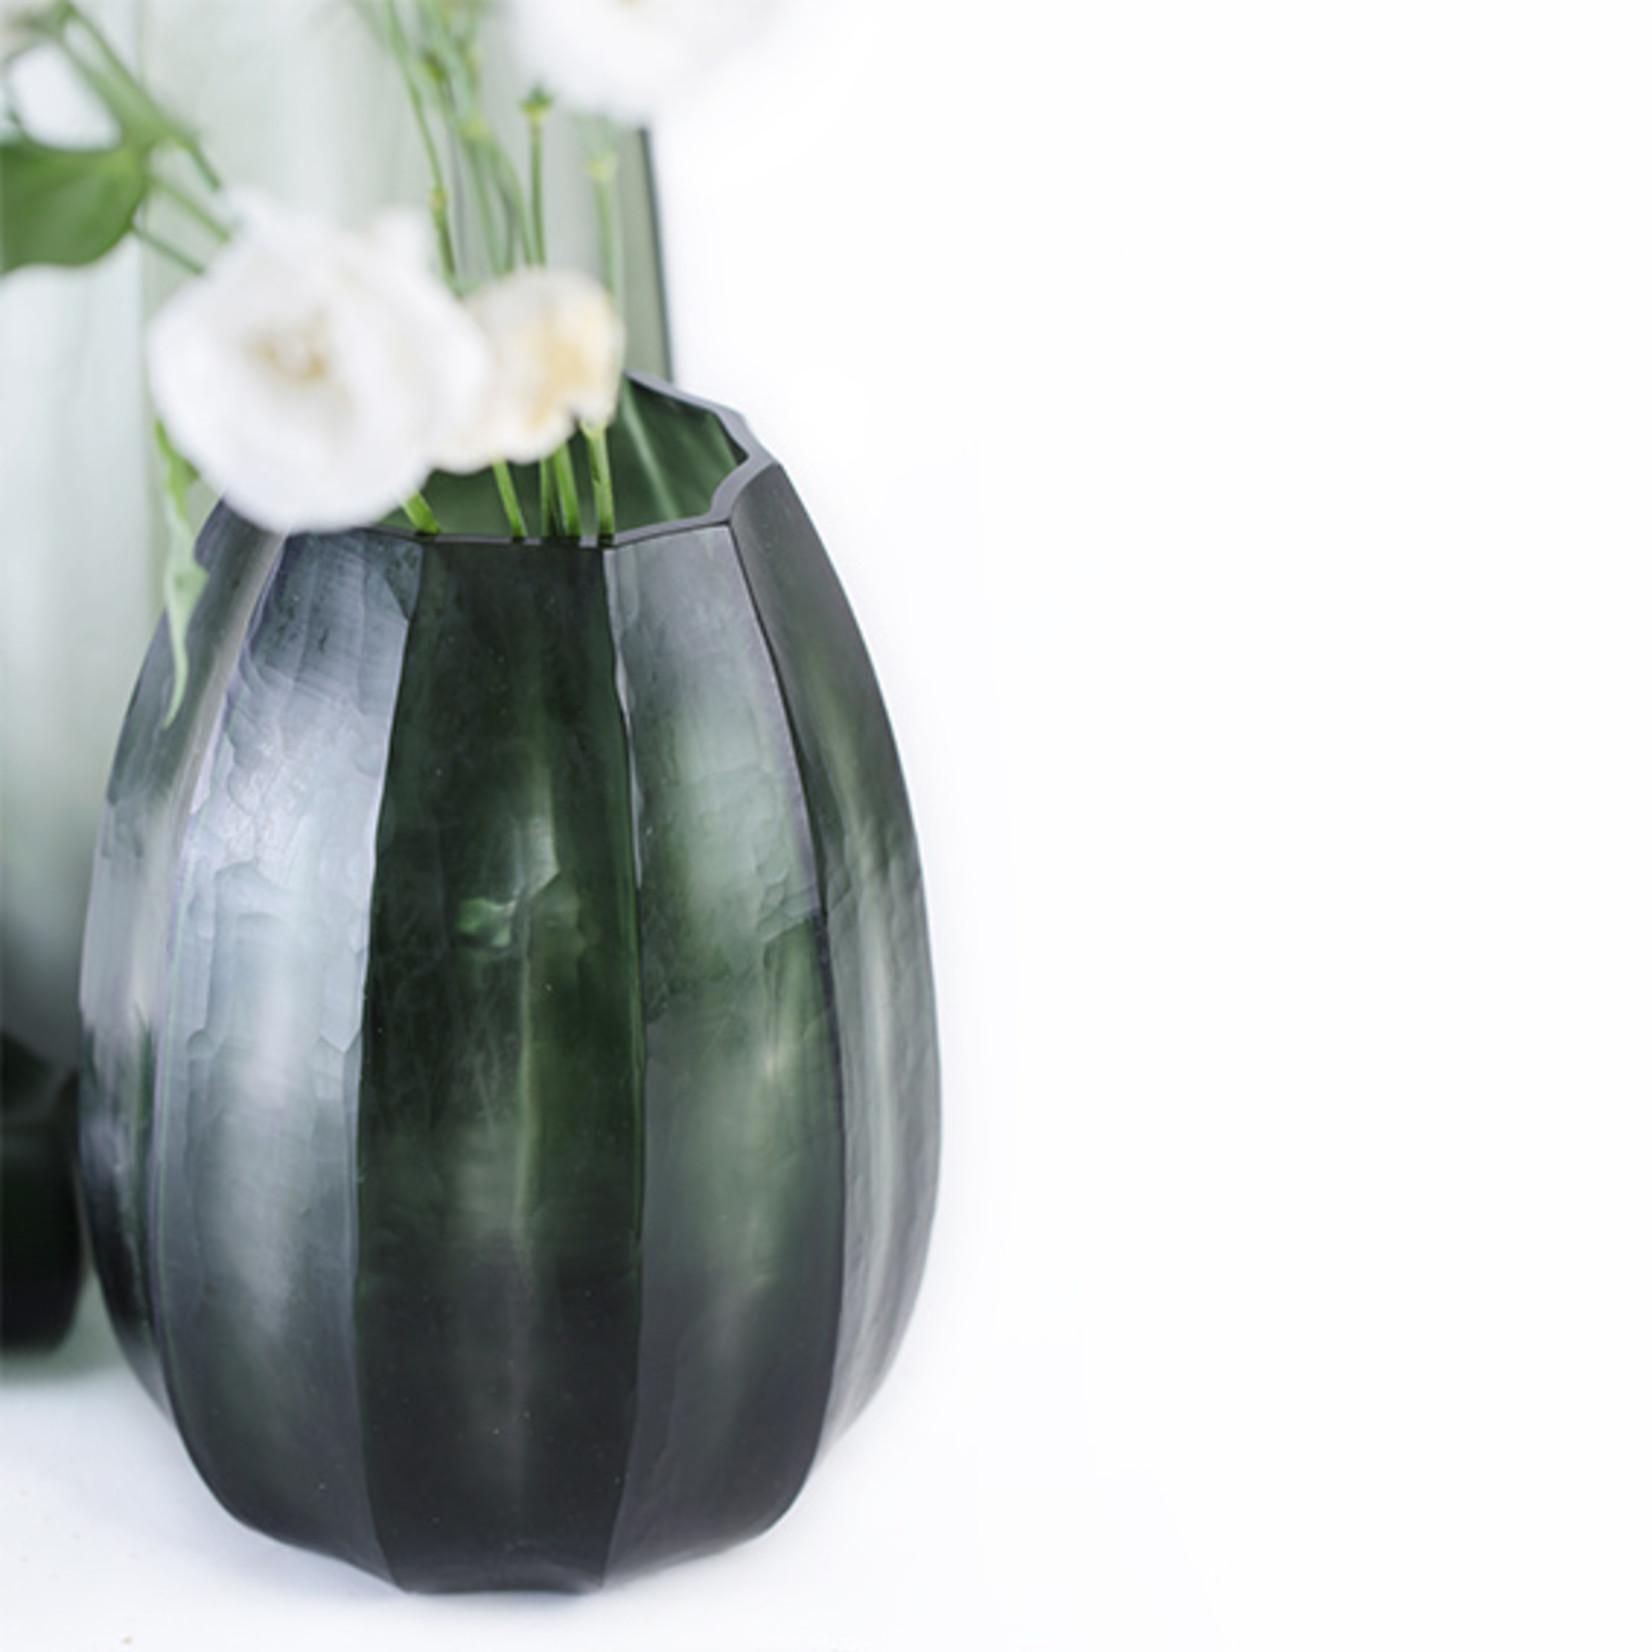 Guaxs Vase Koonam M | Light Steelgrey / Black Steelgrey